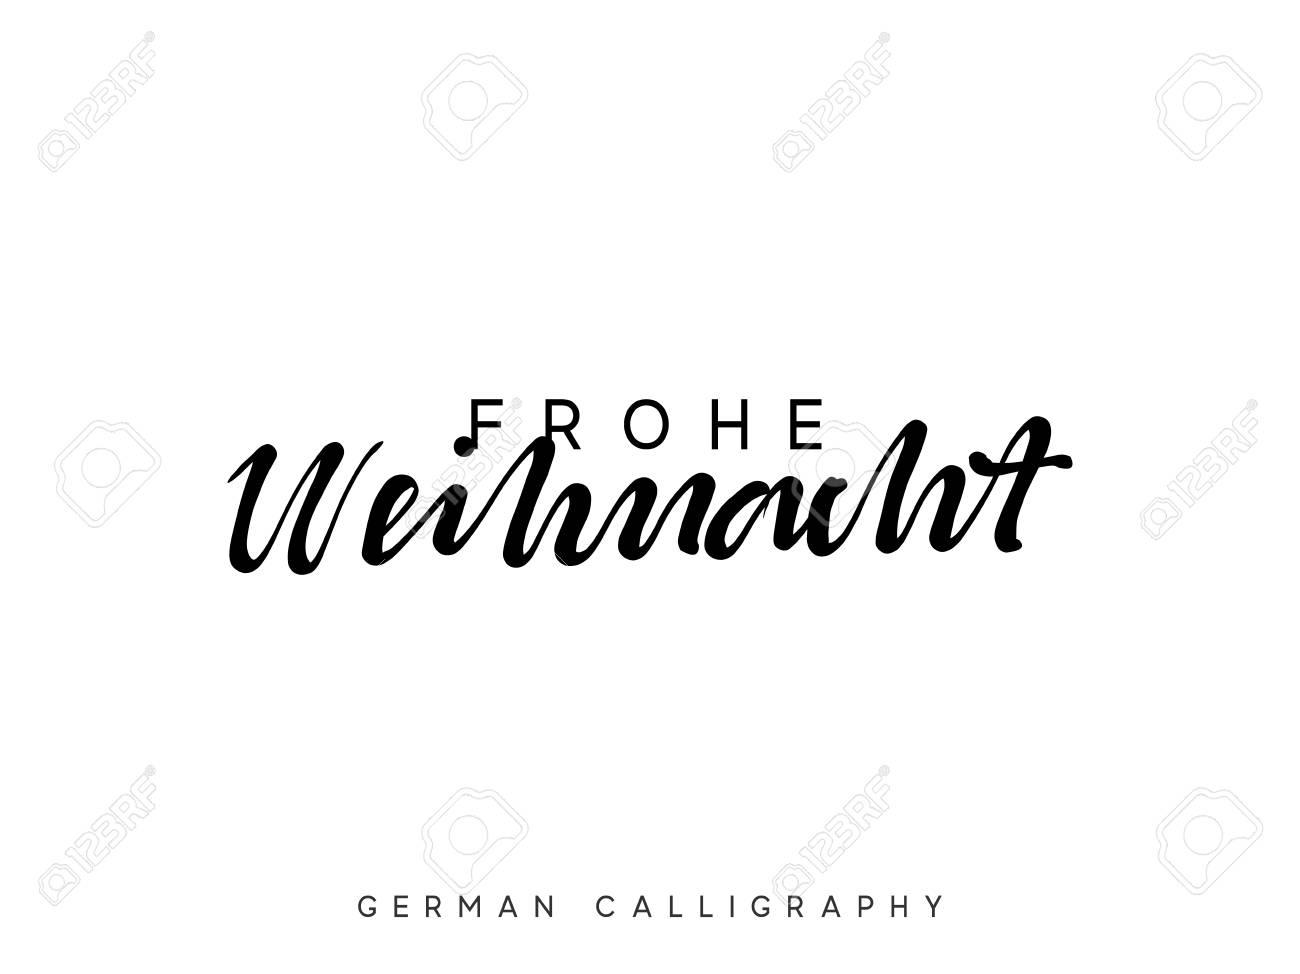 Frohe Weihnachten Text.German Text Frohe Weihnachten Merry Christmas Hand Drawn Calligraphy